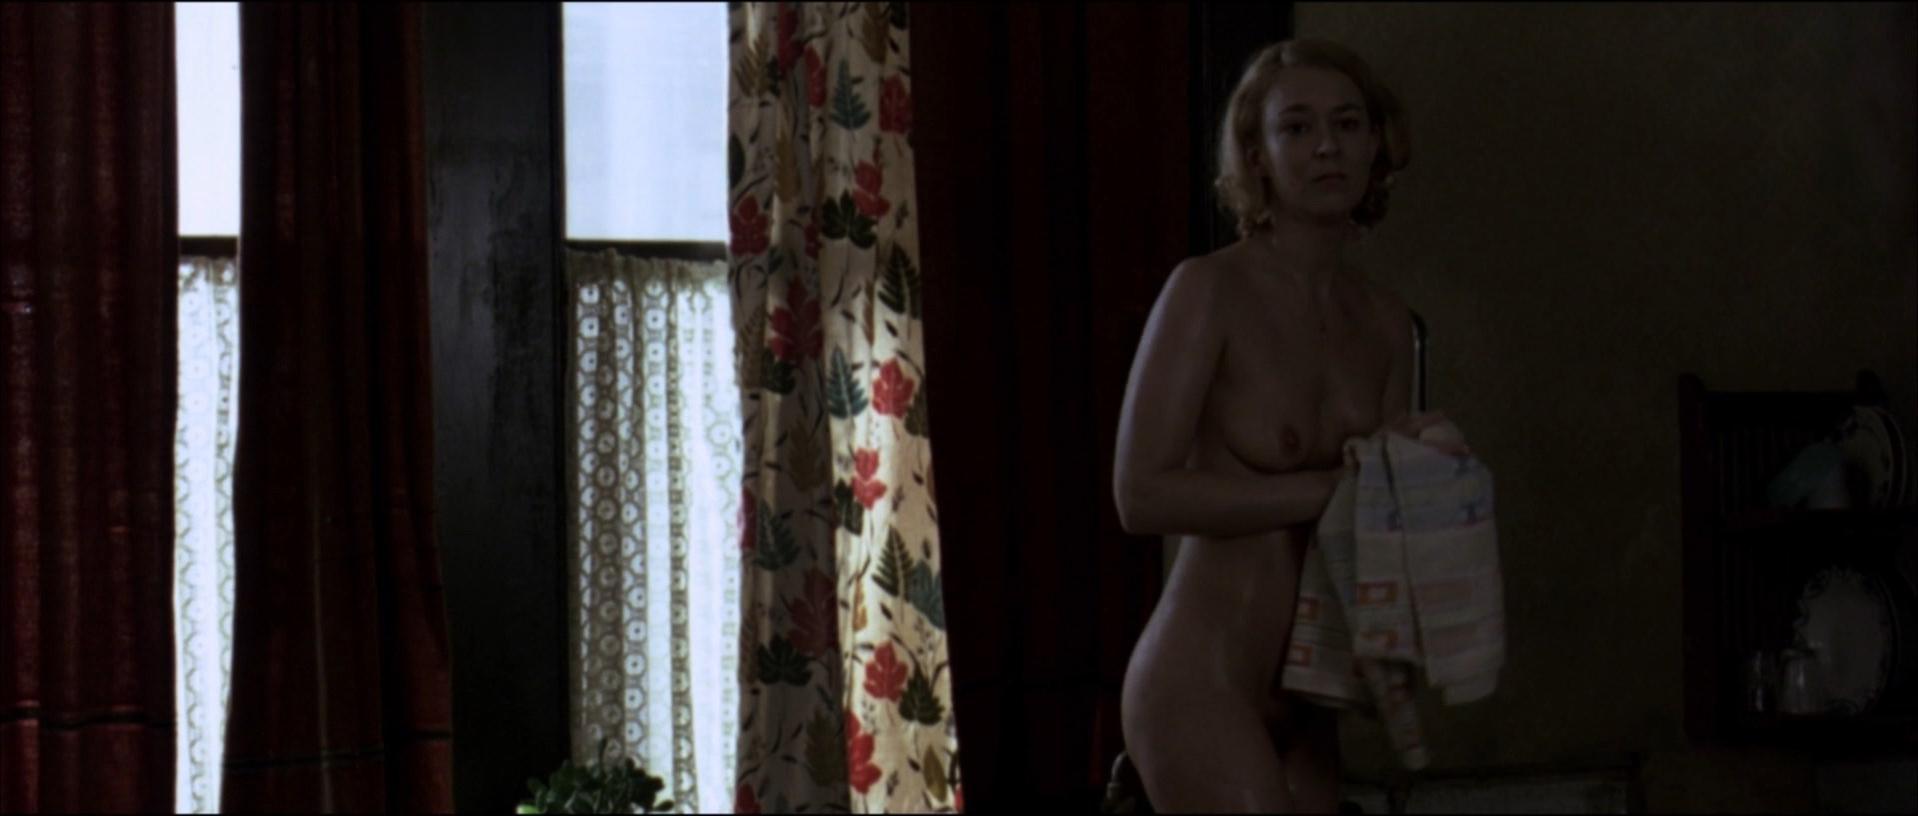 Nackt  Venezia Zavala IMDb: Birth